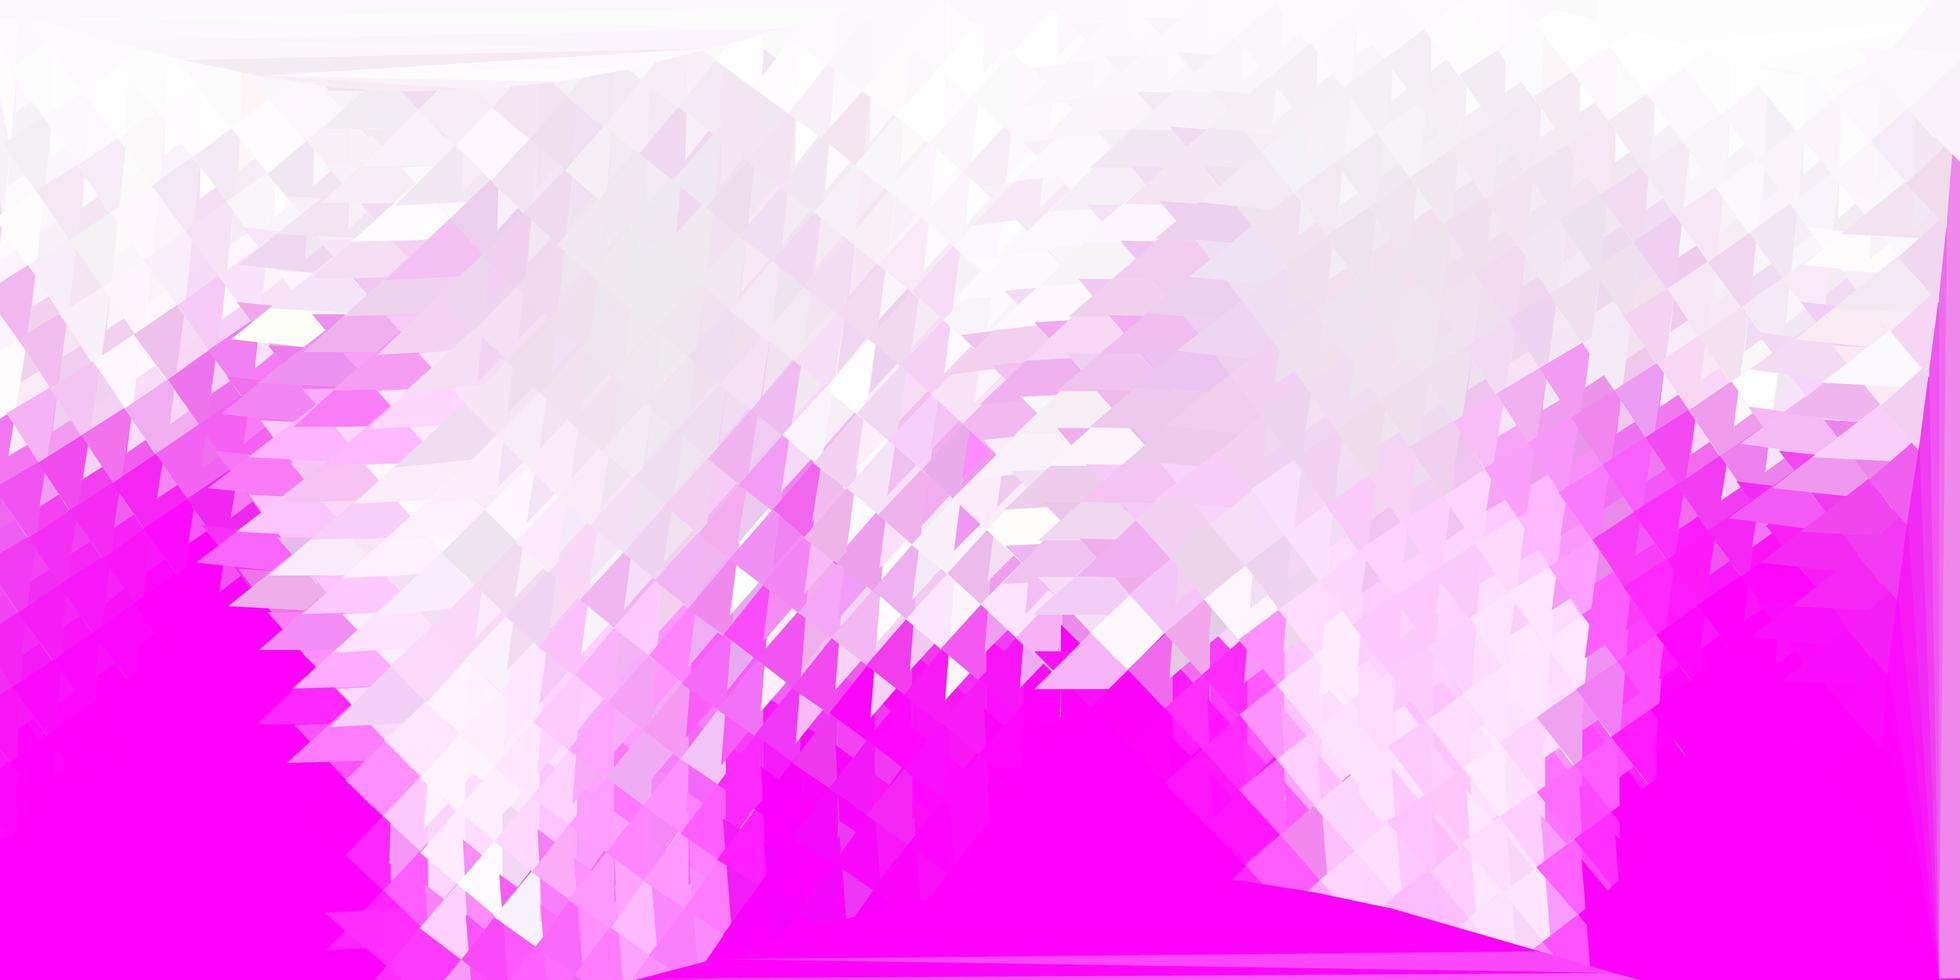 hellrosa Vektor Poly Dreieck Layout.